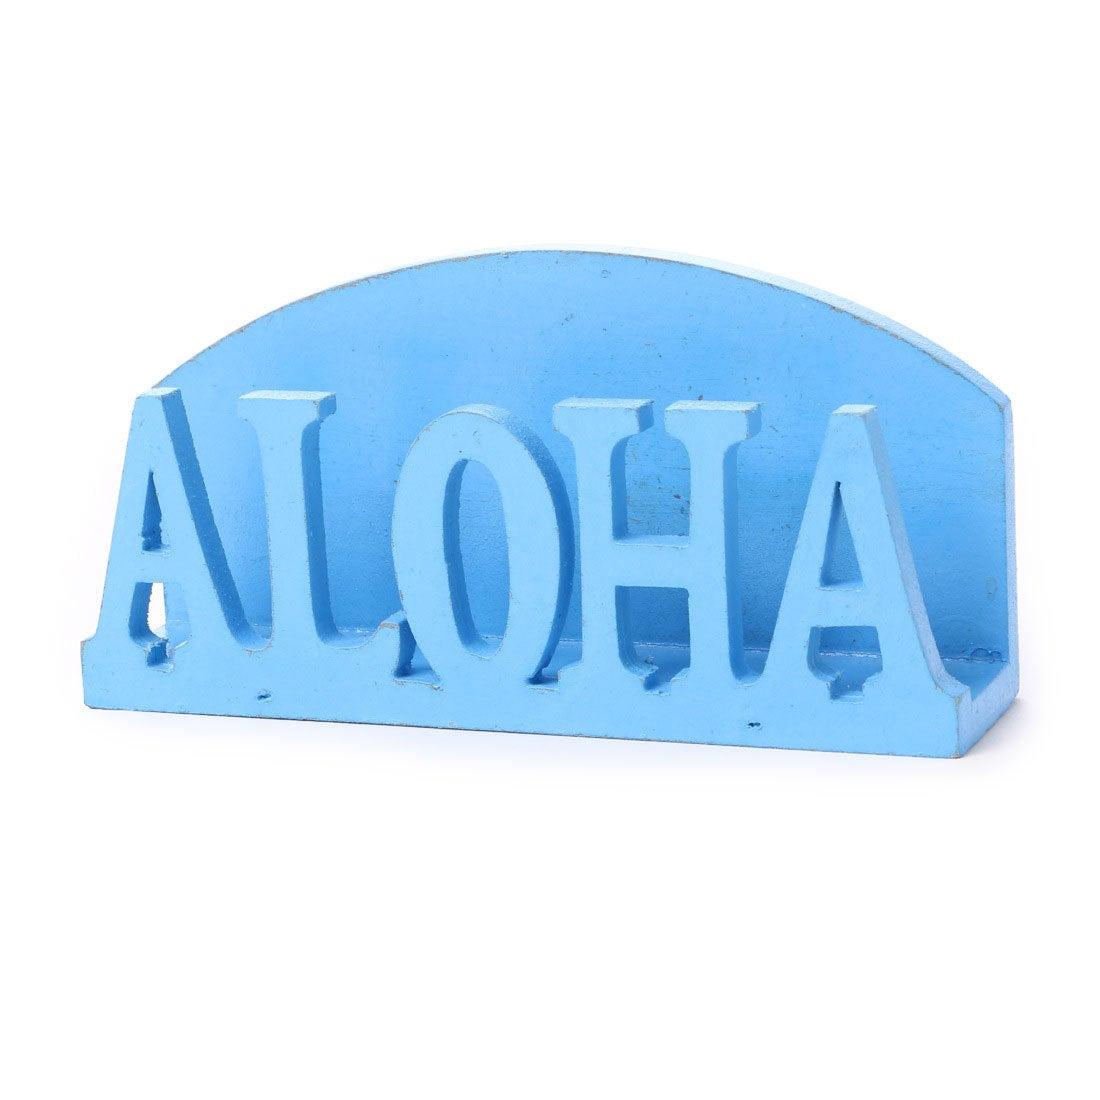 【SALE 50%OFF】【Kahiko】アロハカードスタンド ブルー